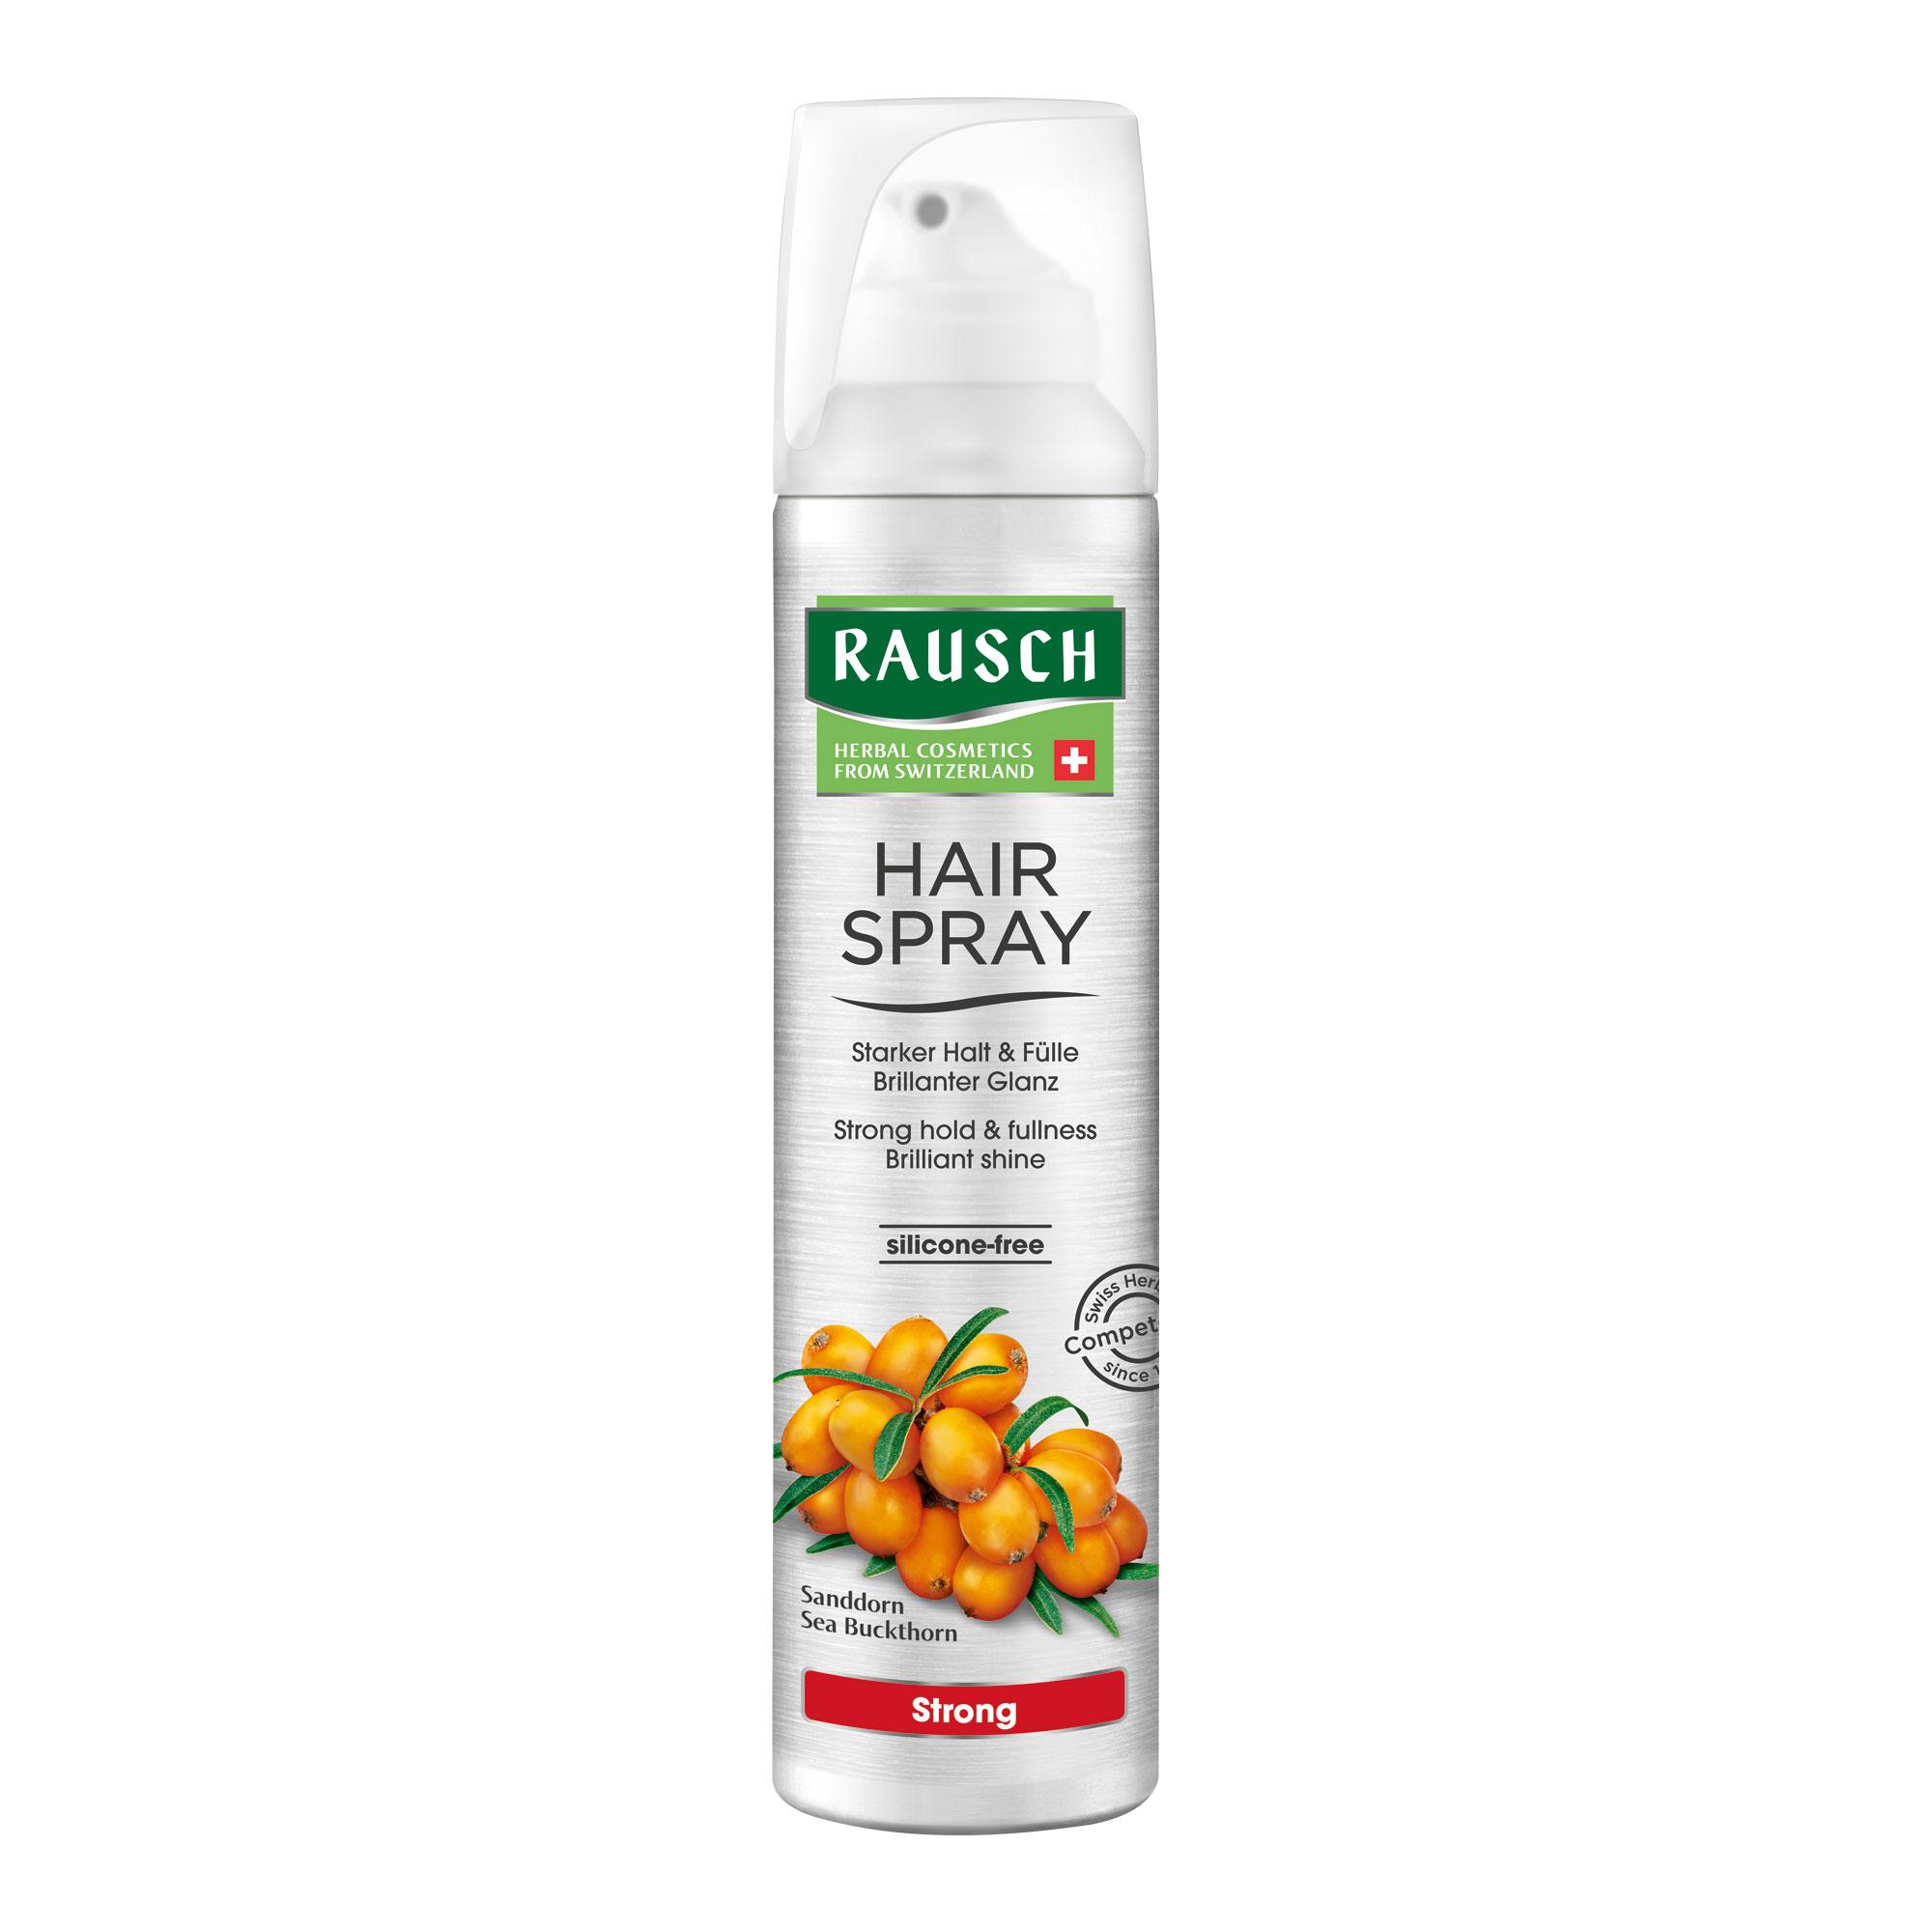 Rausch Haarspray strong Aerosol